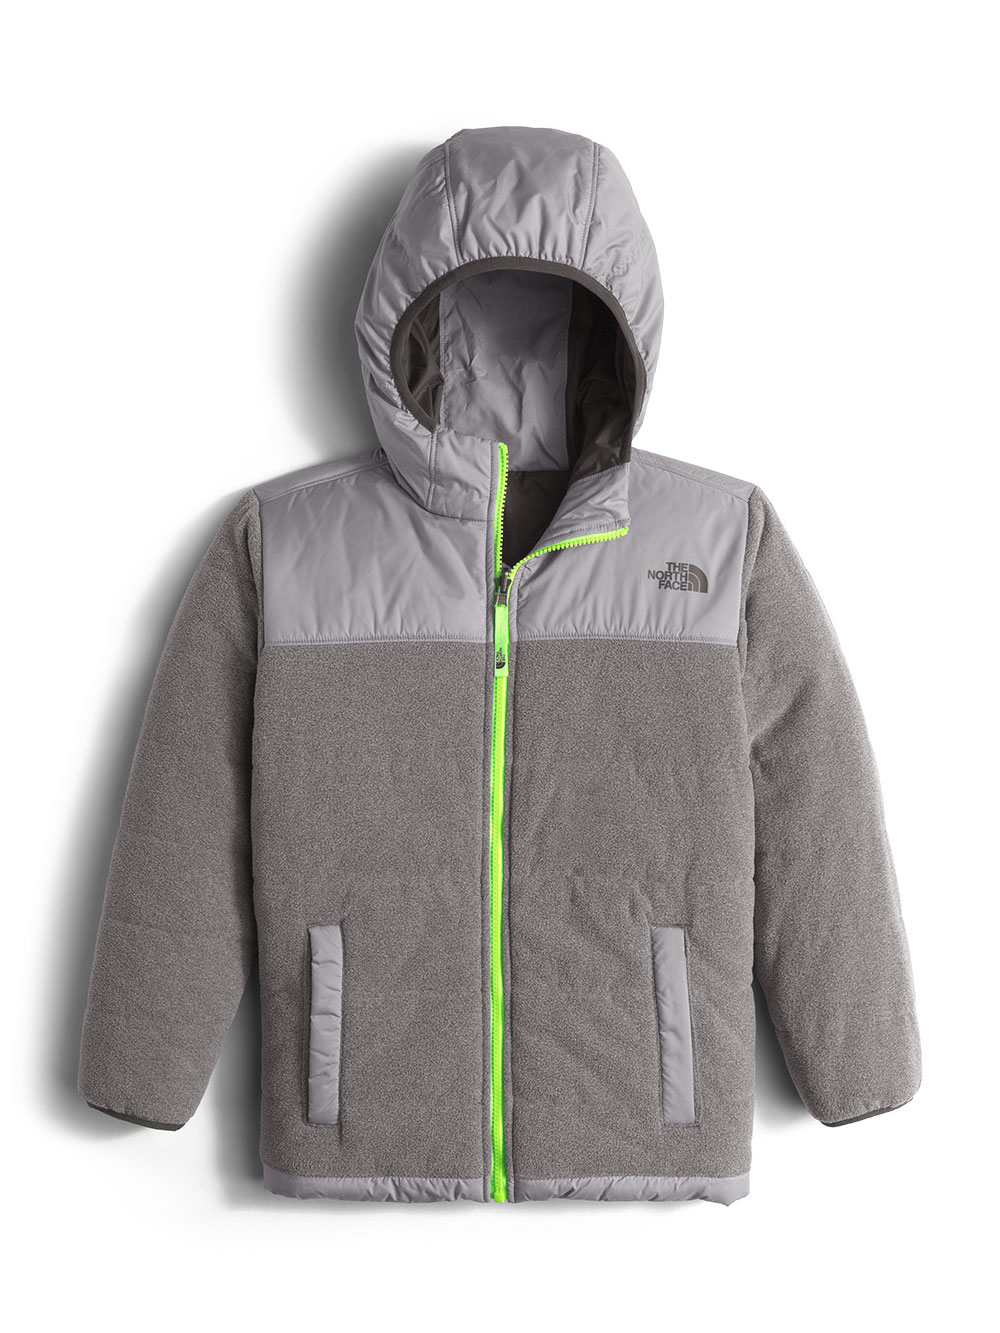 cc7835d1f7b4 The North Face Big Boys  Reversible True or False Jacket (Sizes 8 – 20)